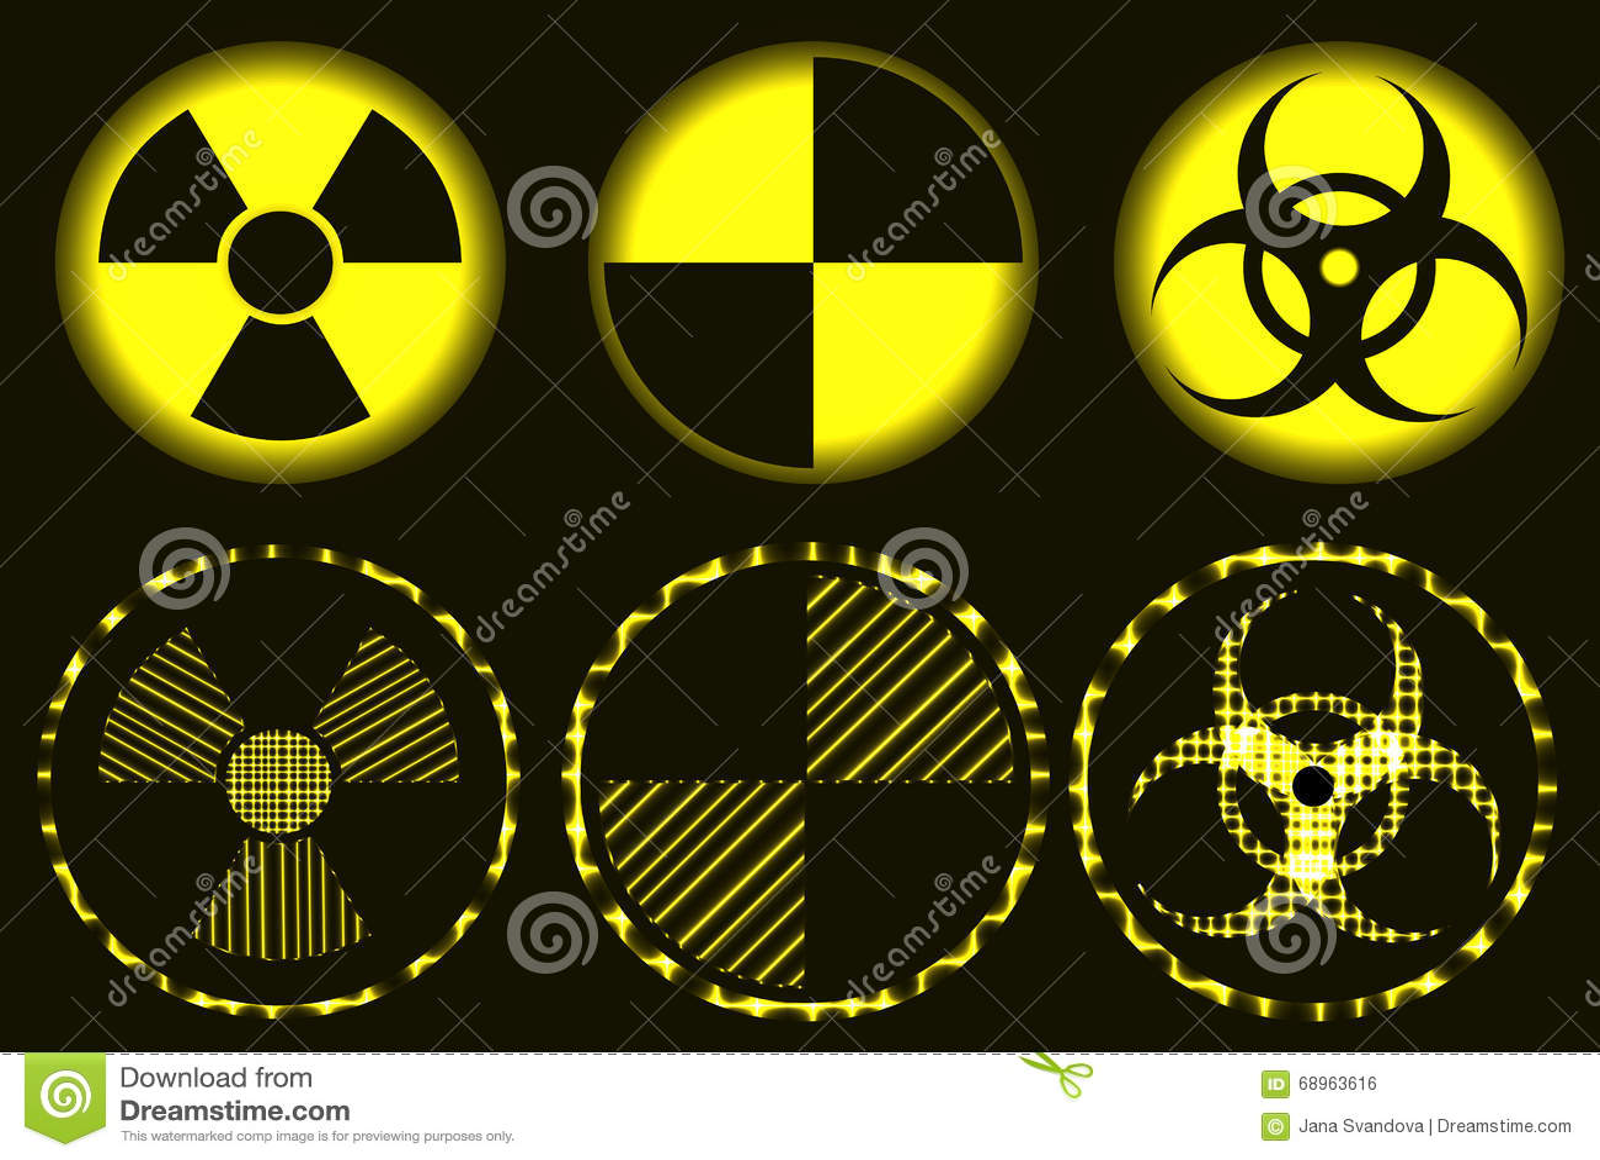 Set Of Neon Nuclear Hazard Quarantine And Biohazard Symbols Stock